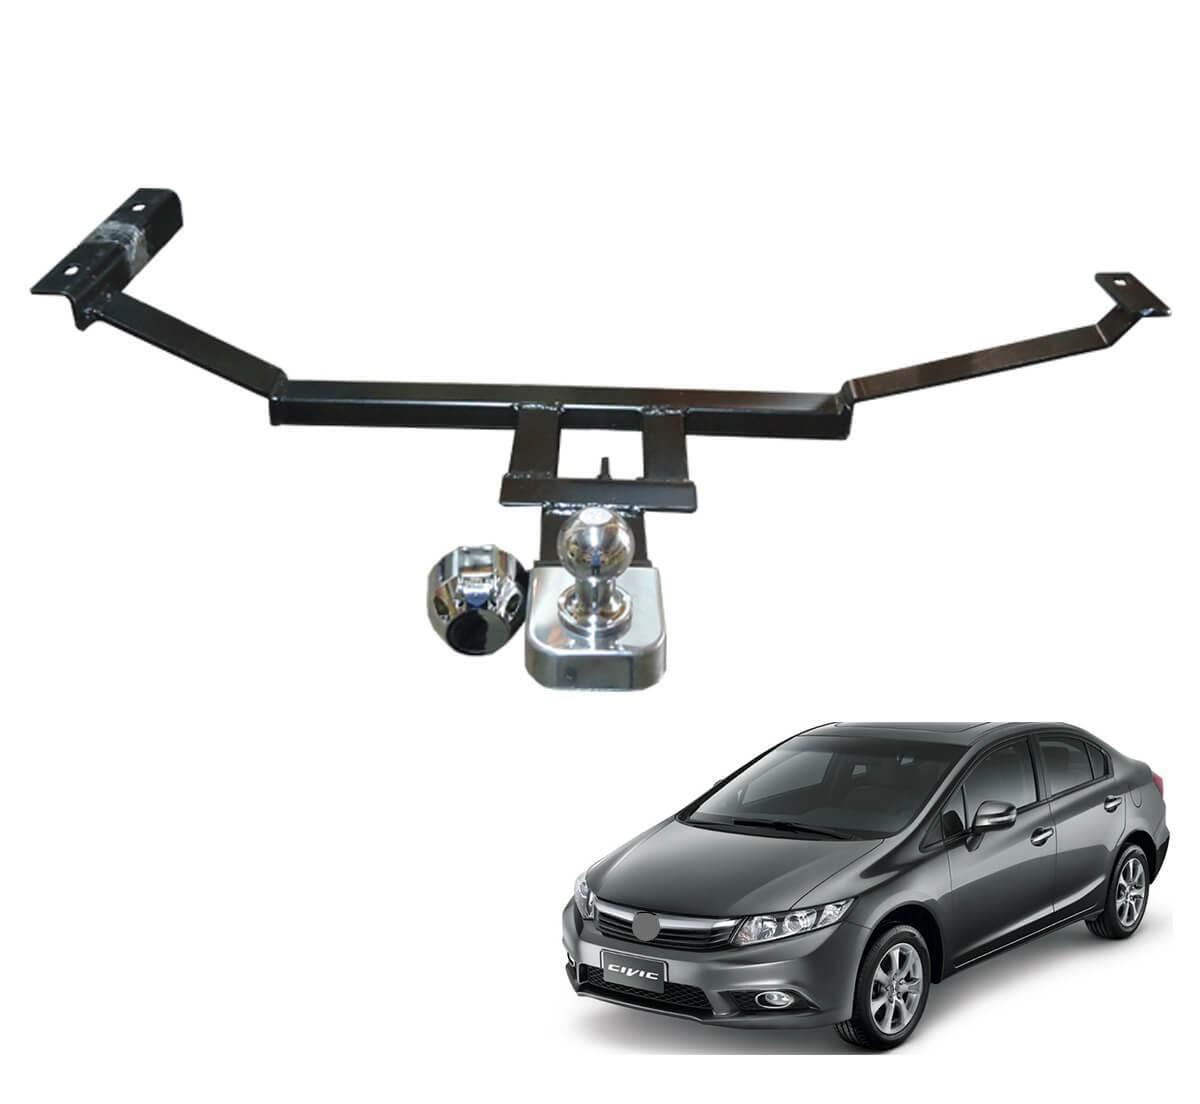 Engate de reboque fixo Civic 2012 a 2016